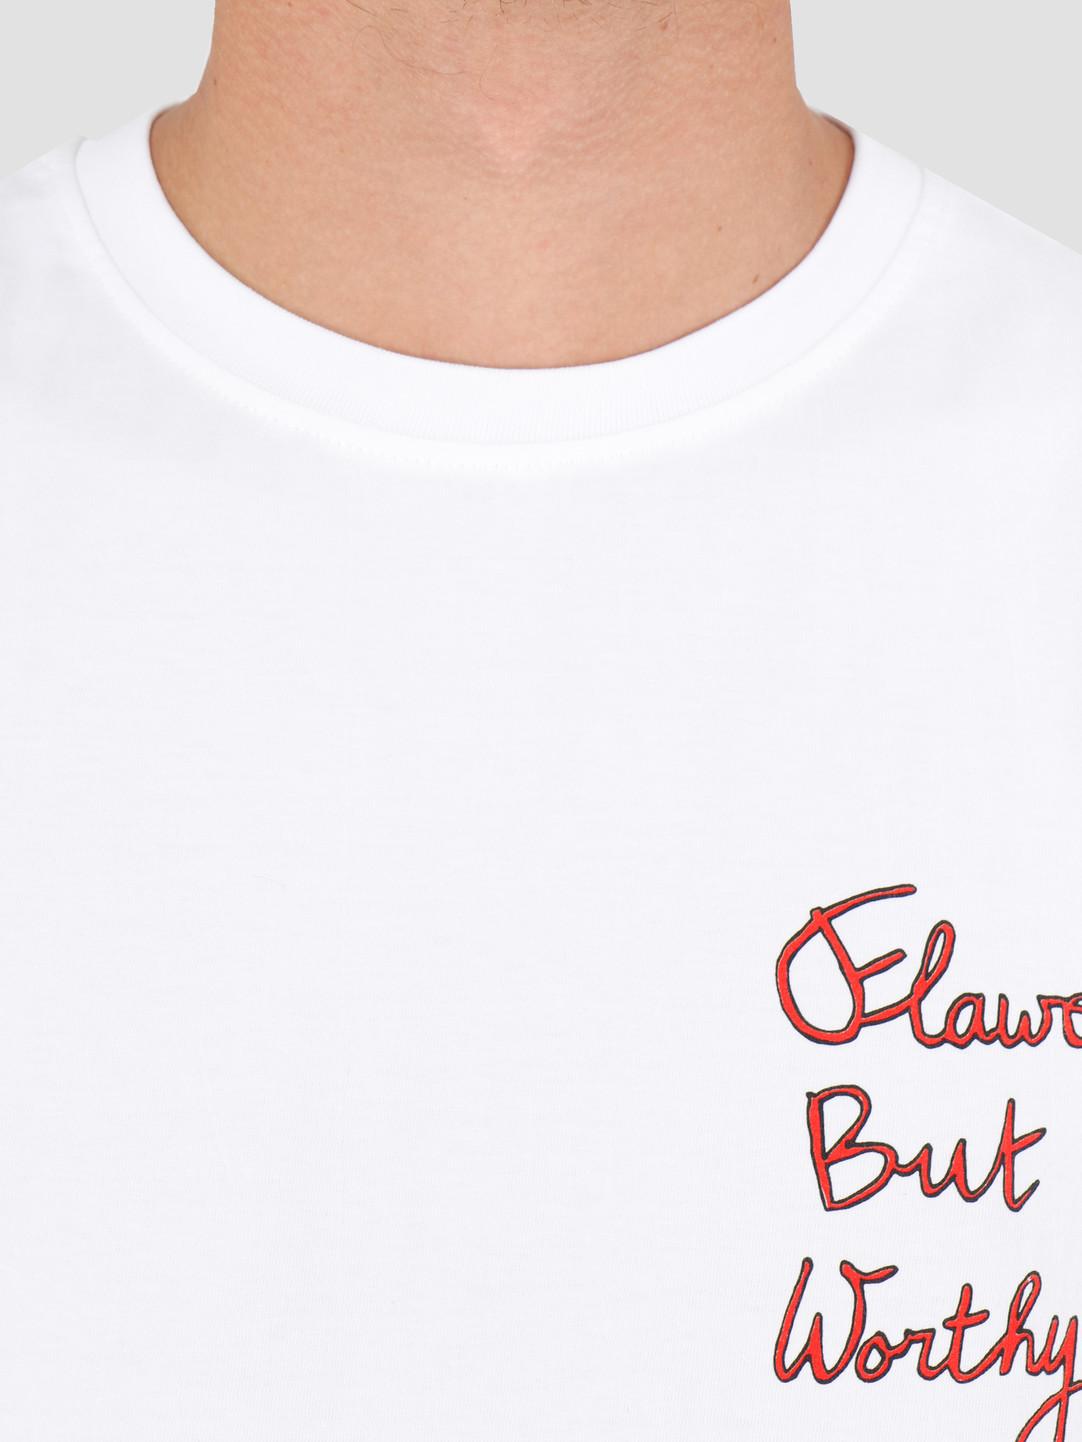 FRESHCOTTON FreshCotton Flawed But Worthy T-Shirt And Book